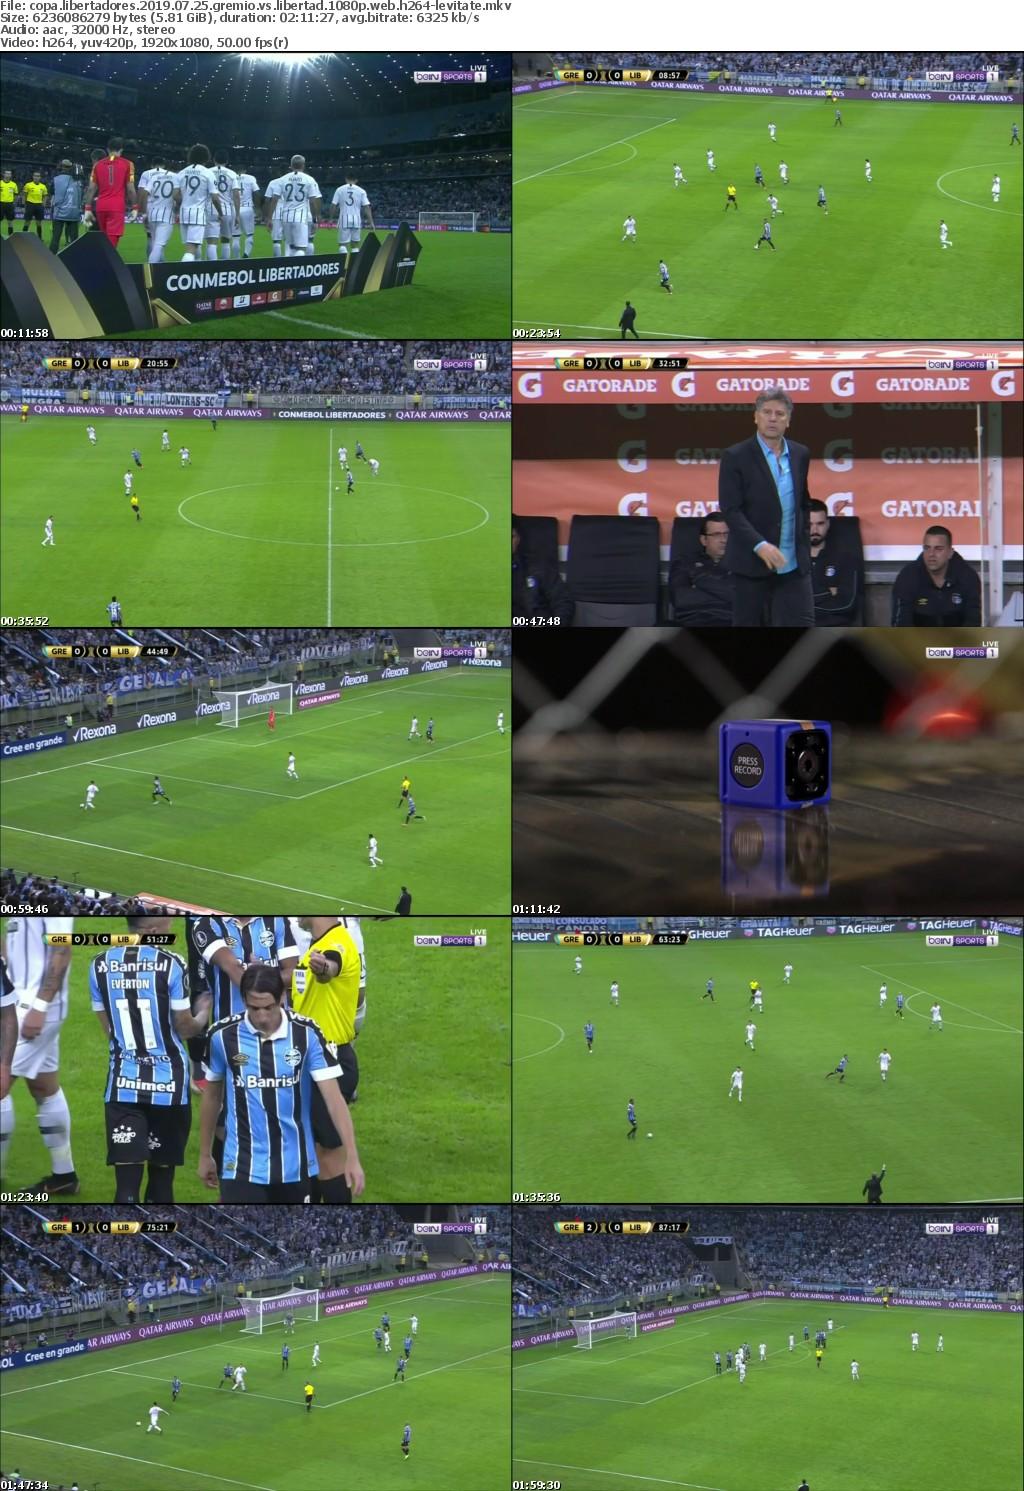 Copa Libertadores 2019 07 25 Gremio vs Libertad 1080p WEB H264-LEViTATE